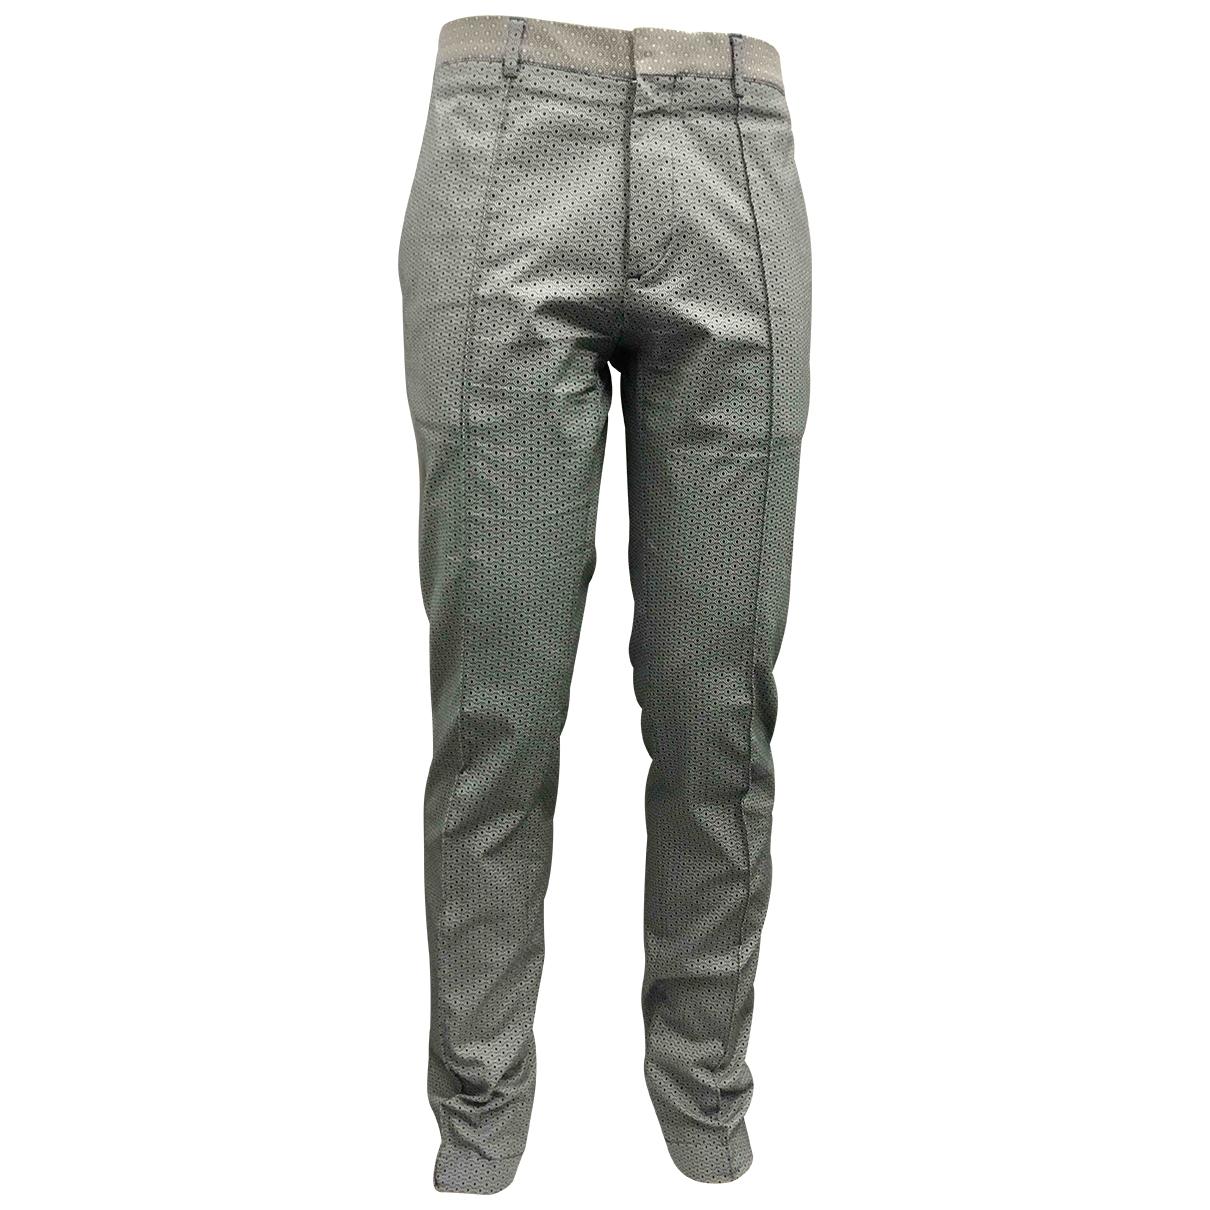 Zara \N Green Cotton Trousers for Men 32 UK - US